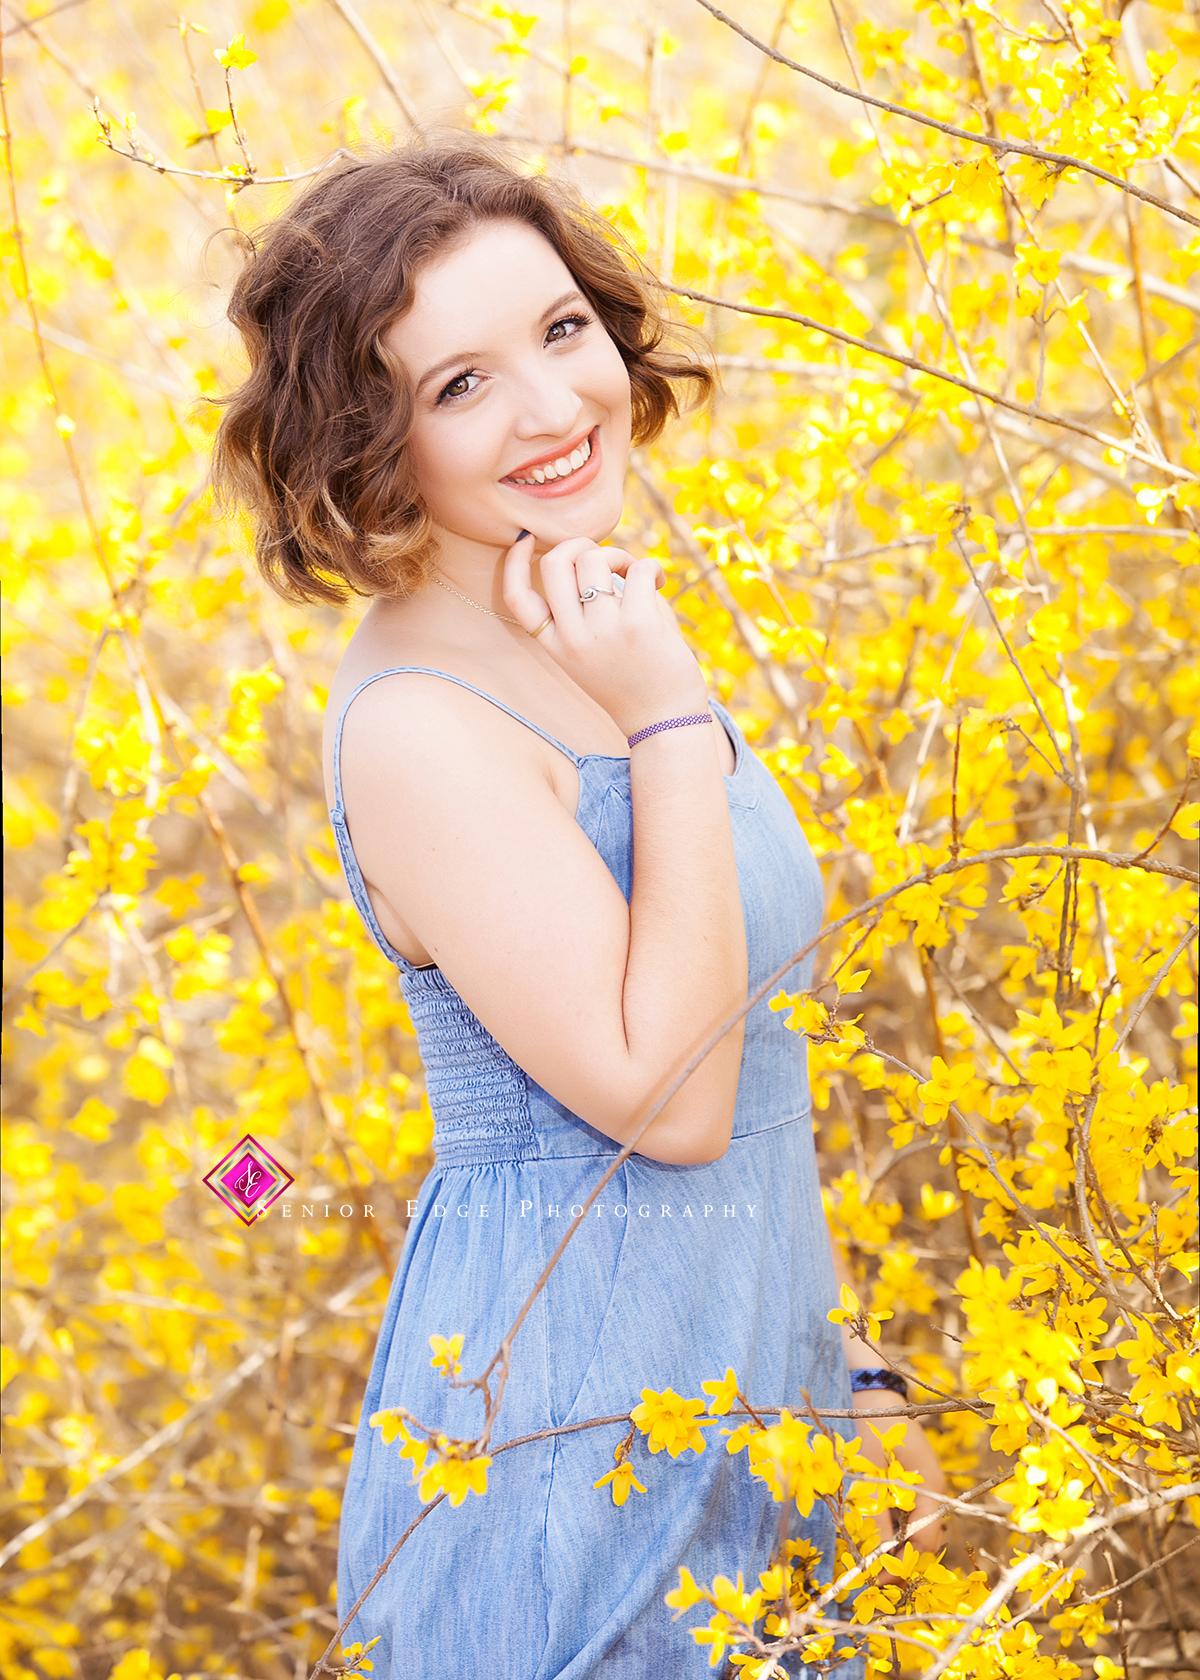 Senior Edge Photography (8)